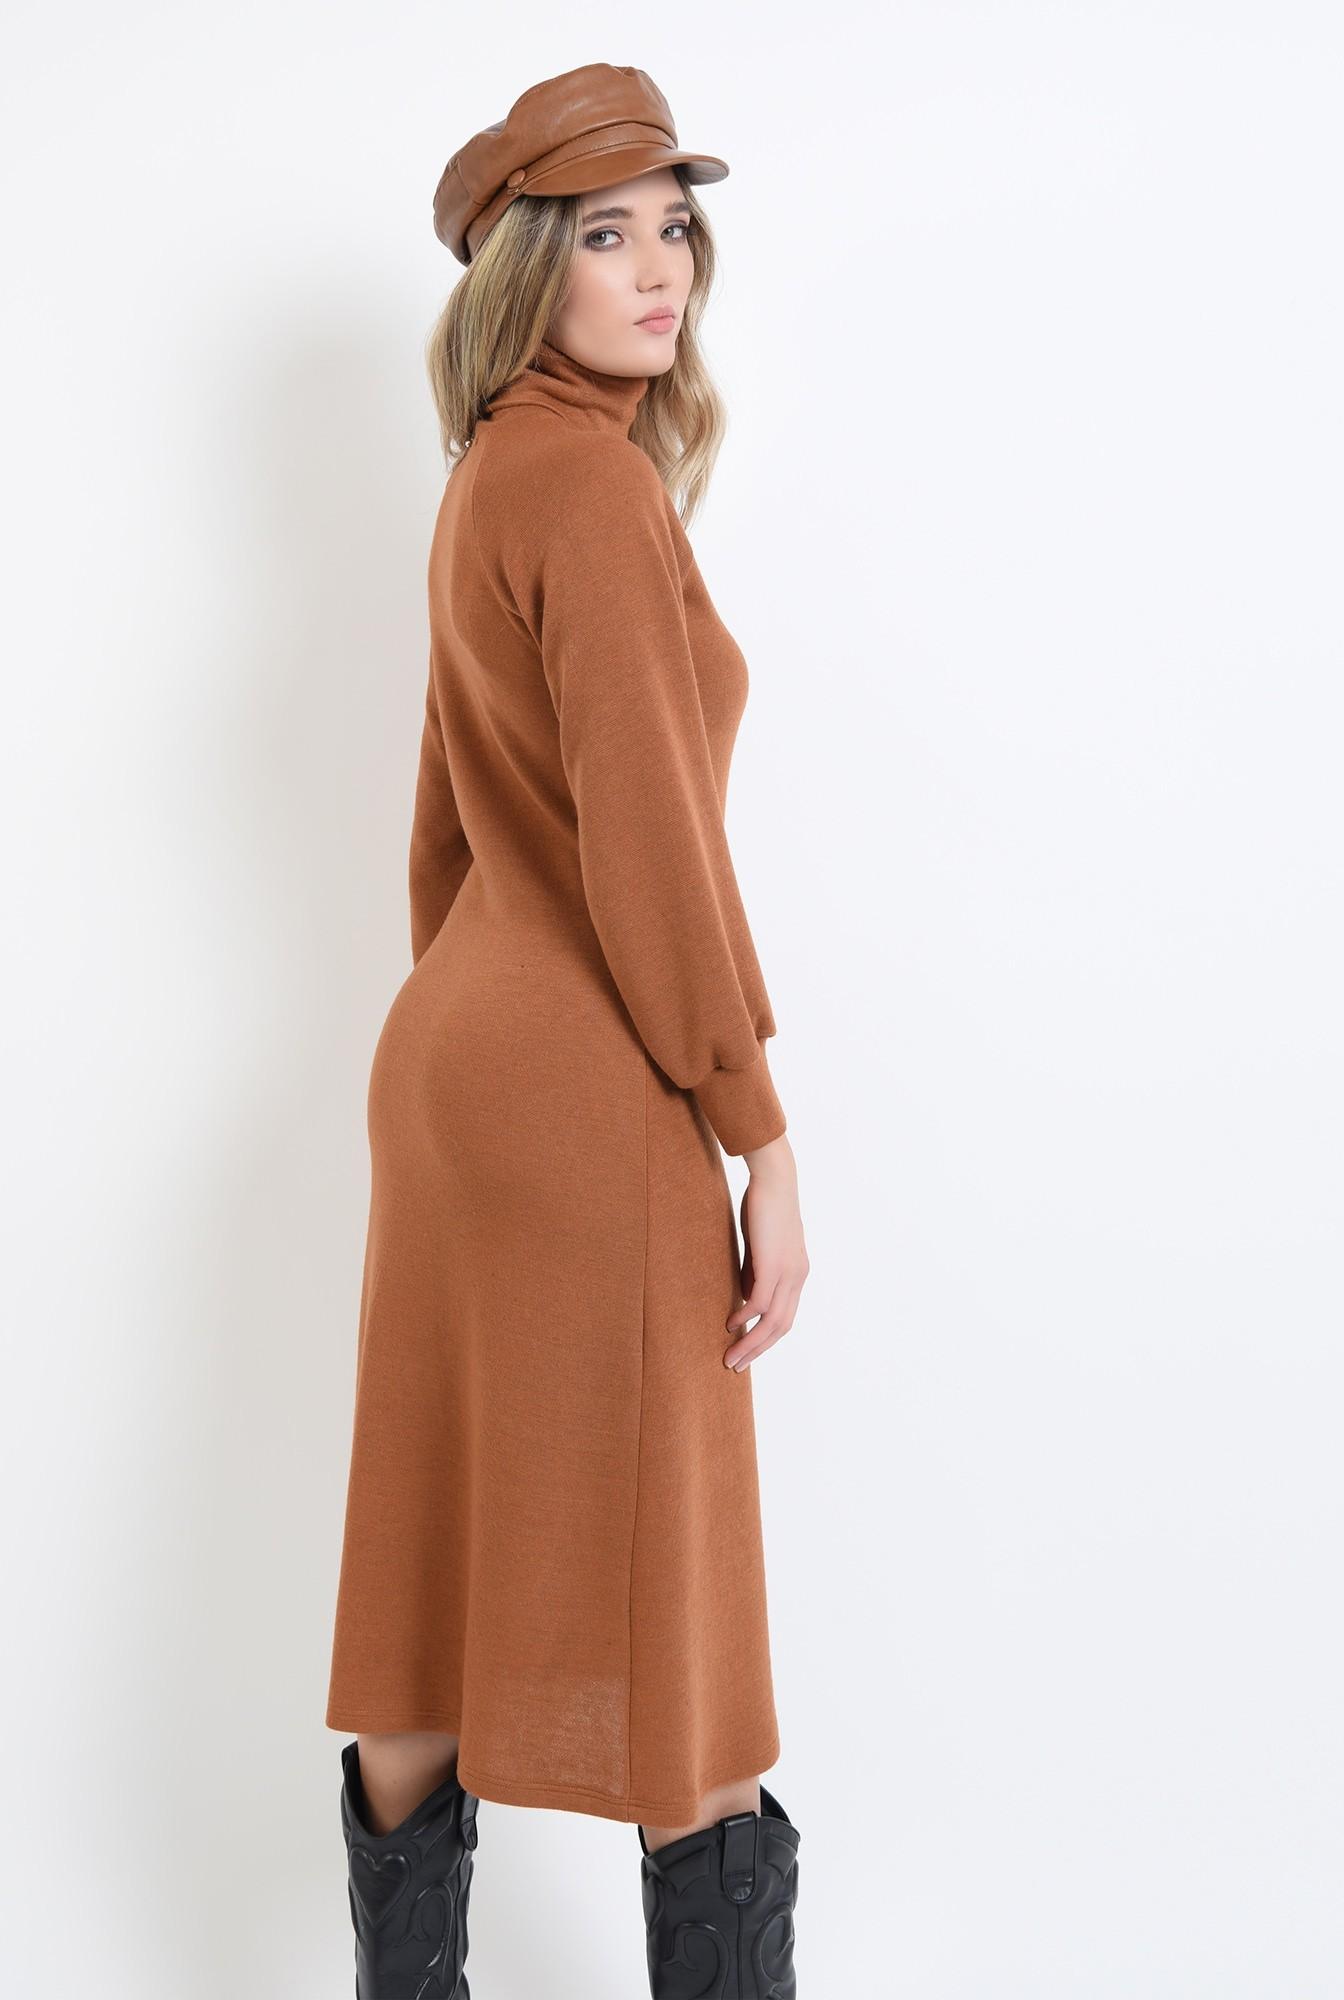 1 - 360 - rochie midi, evazata, din tricot, cu maneca bufanta